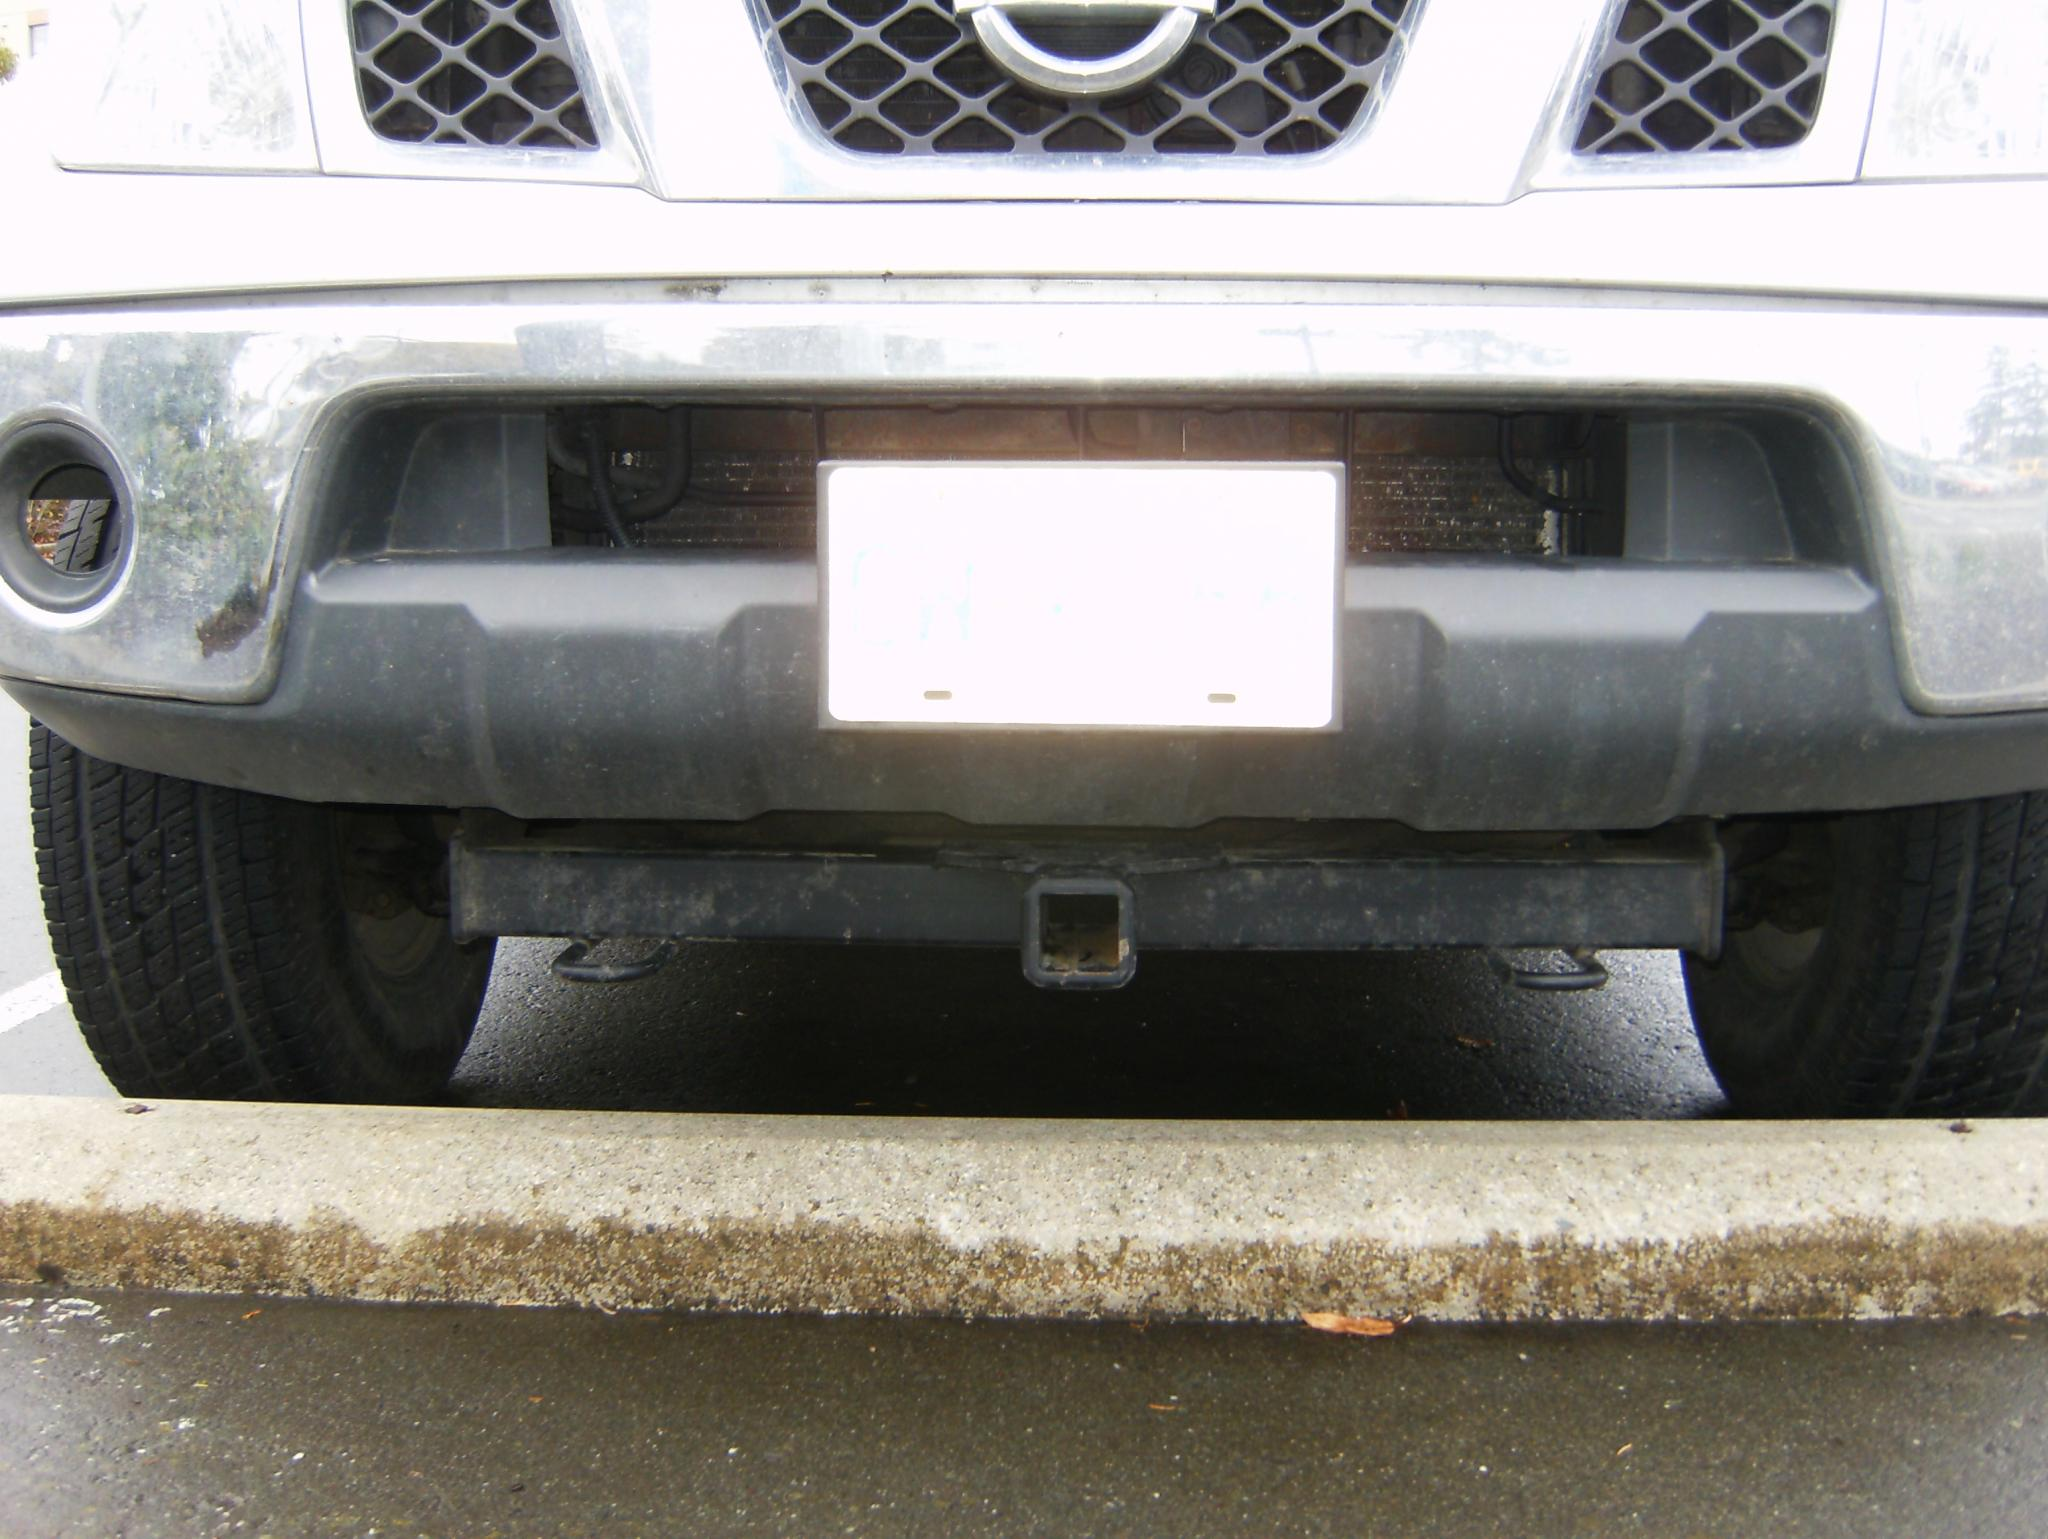 2011 Nissan Xterra >> FS Curt front receiver hitch - Nissan Frontier Forum